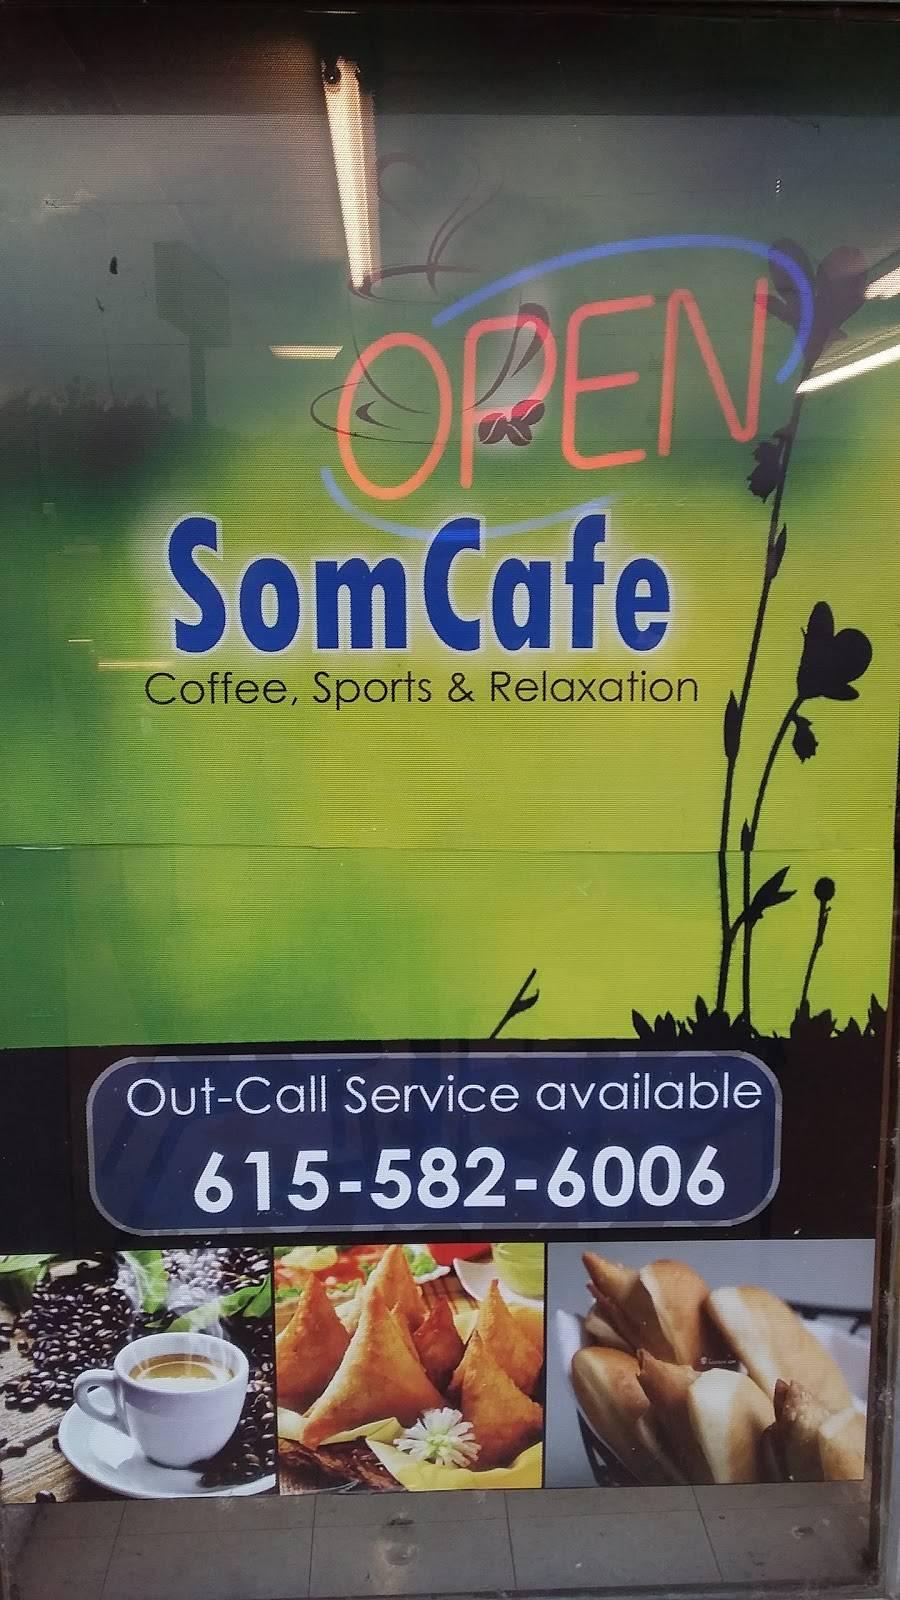 Somali Coffee Shop - cafe  | Photo 5 of 6 | Address: 1040 Murfreesboro Pike, Nashville, TN 37217, USA | Phone: (615) 582-6006